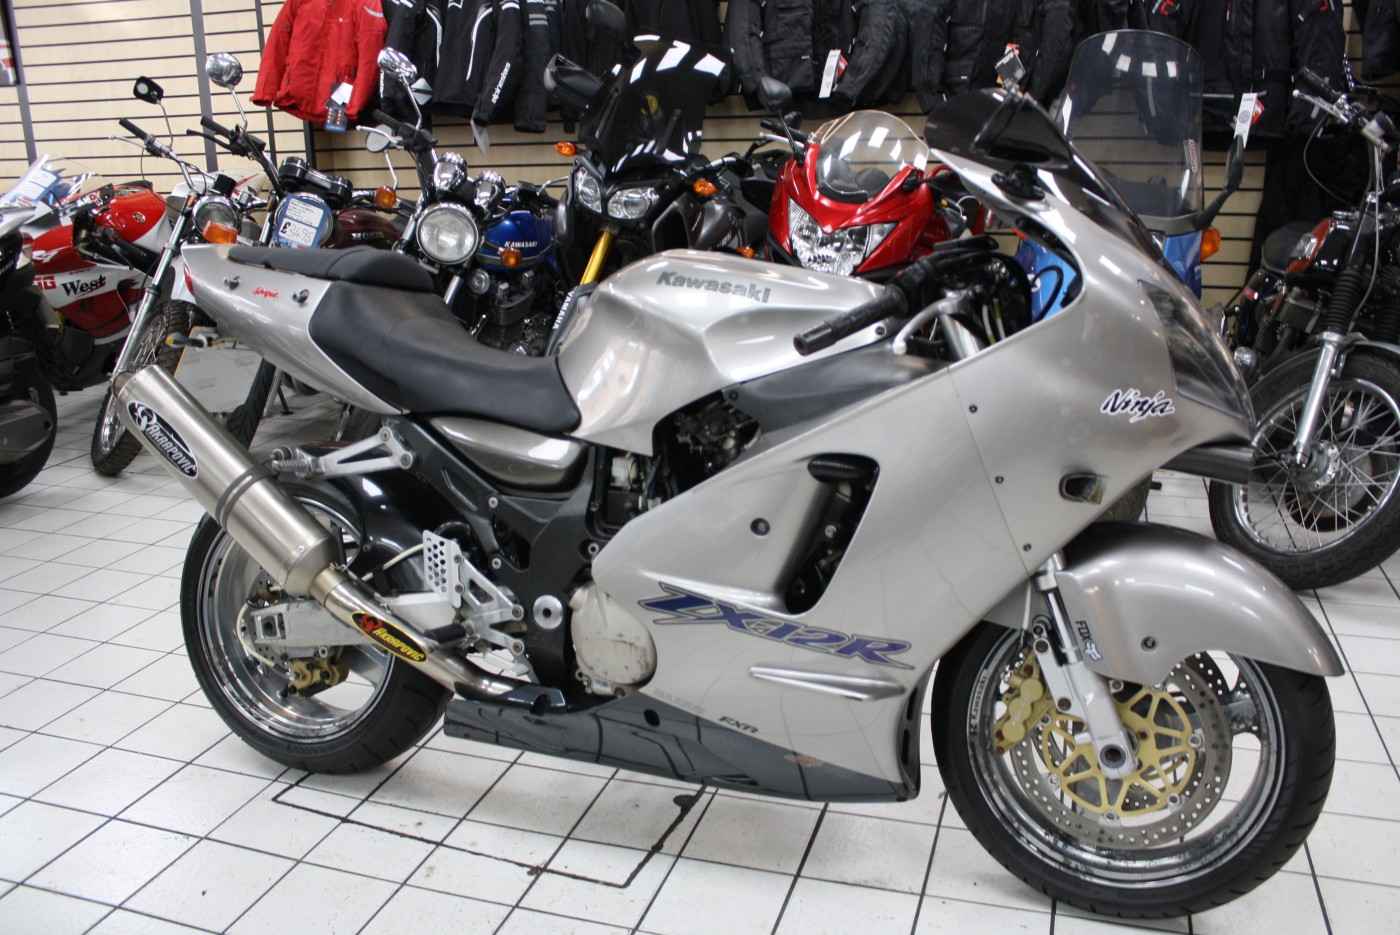 2001 Kawasaki ZX12R Silver Akapovic 37K